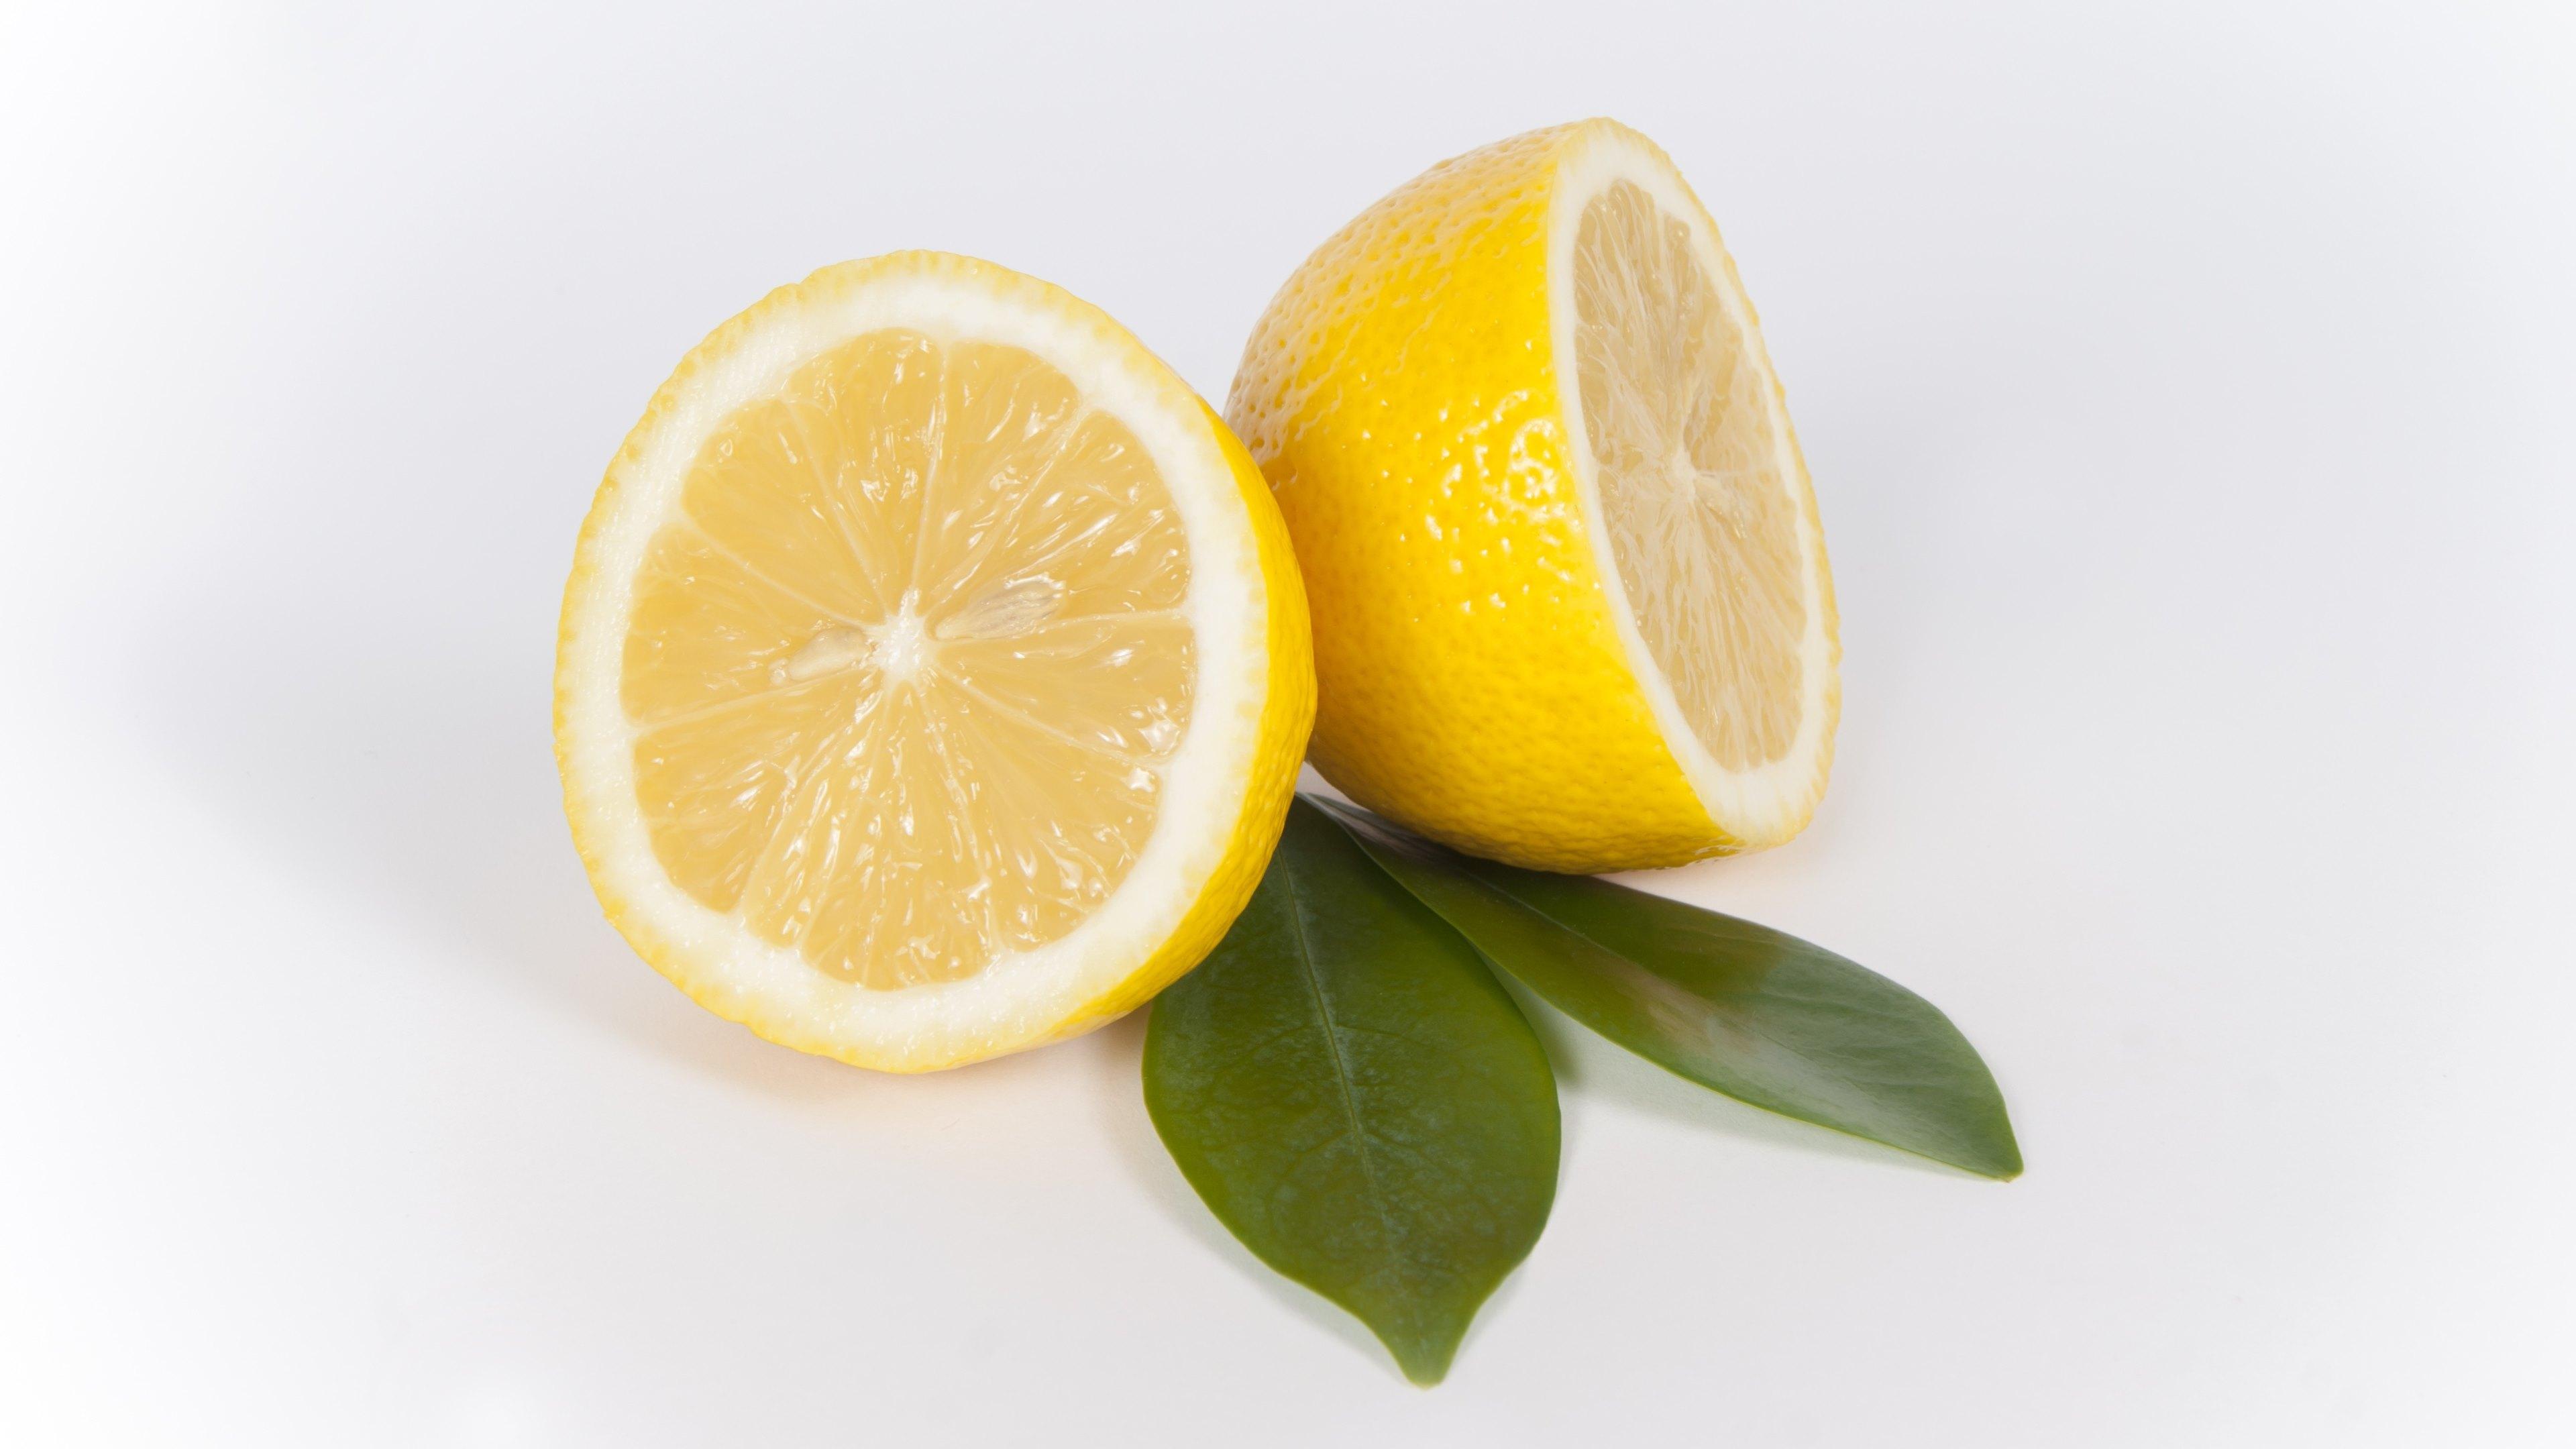 lemon lime blueberries wallpaper hd wallpapers